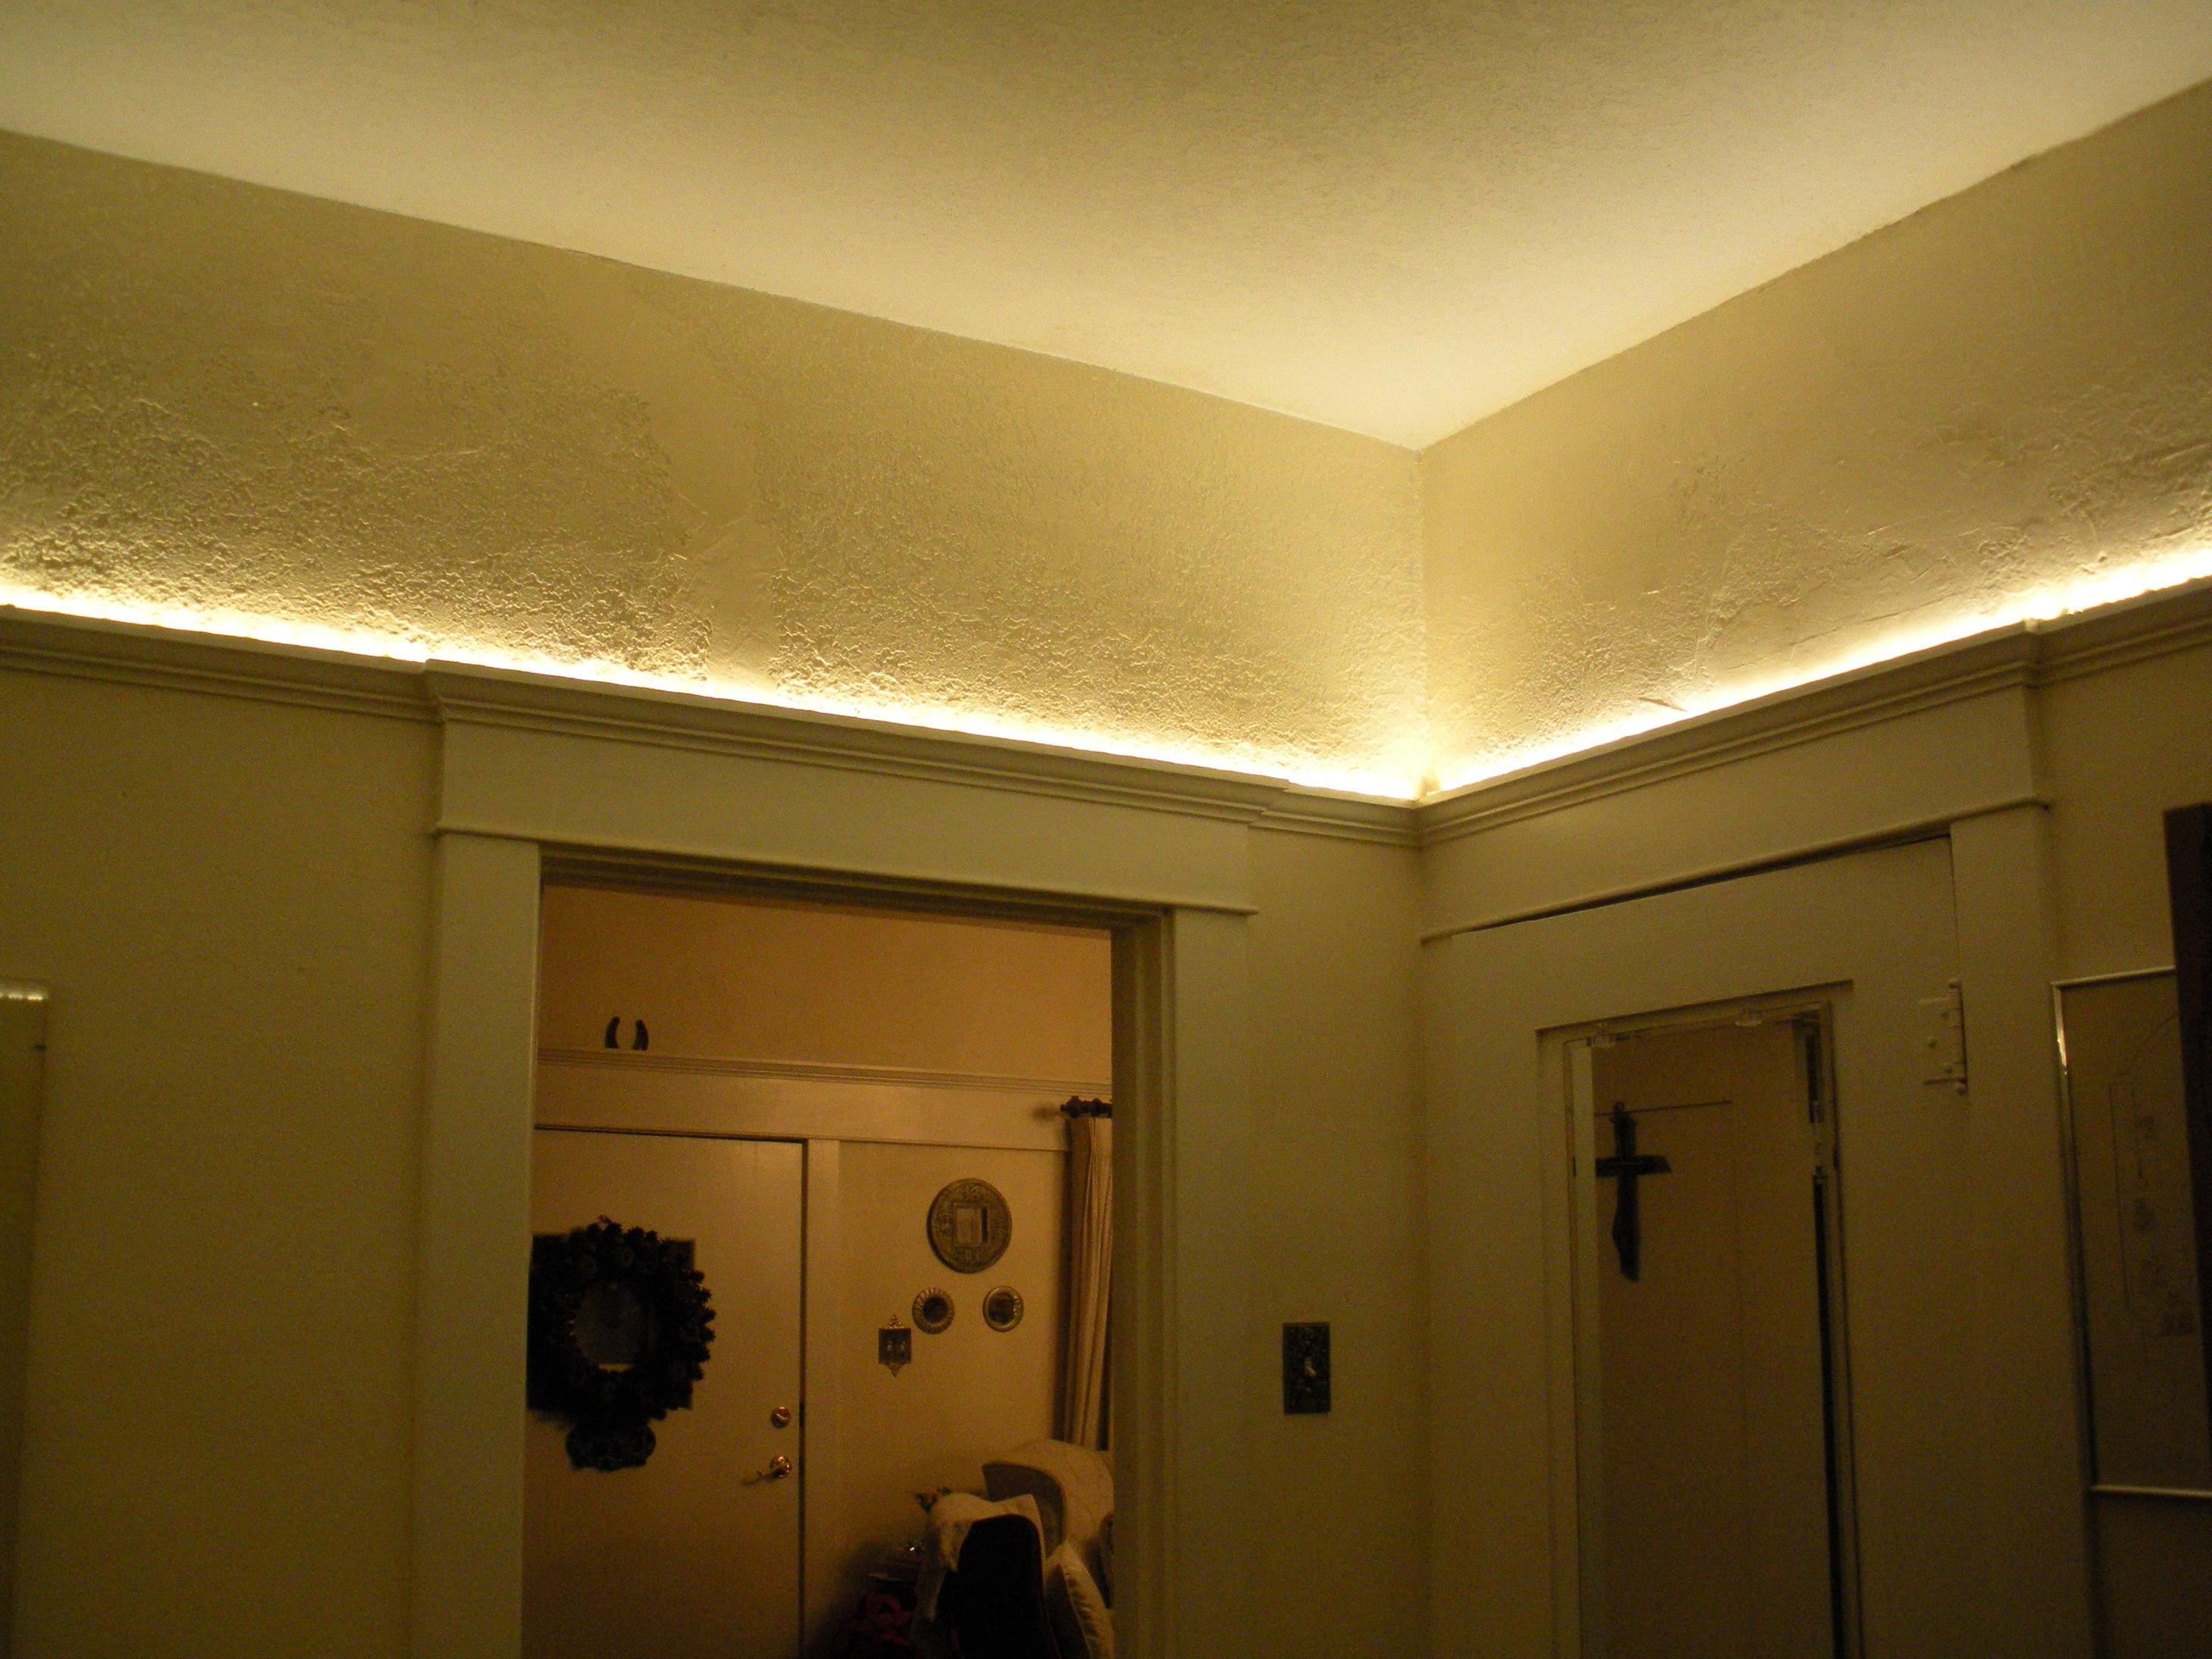 Basement Lighting Fixtures: Basement Ceiling Lights For Brighter Cellar